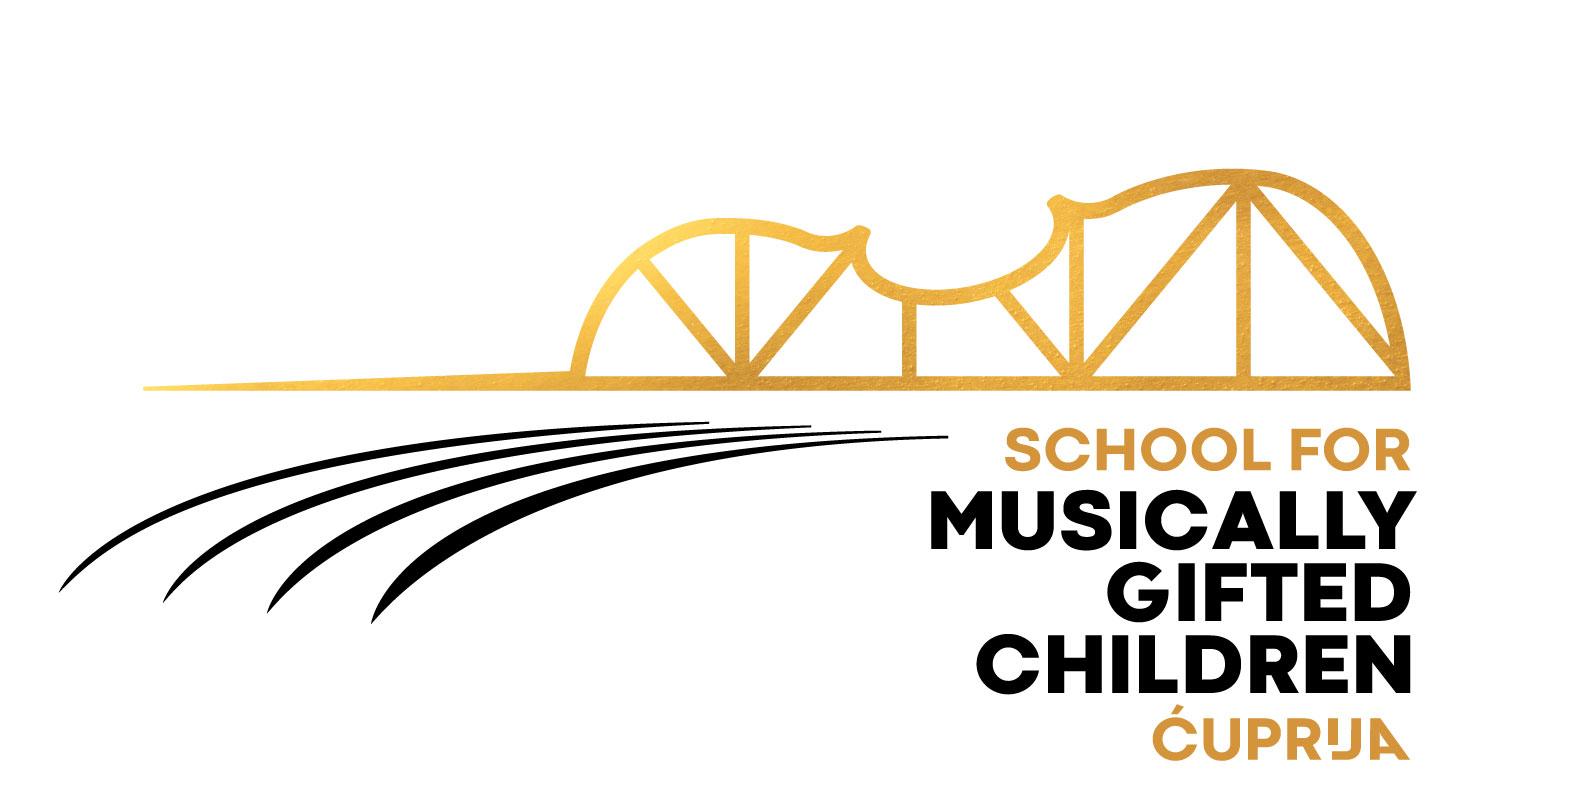 Skola-za-muzicke-talente-logo-2-ENG